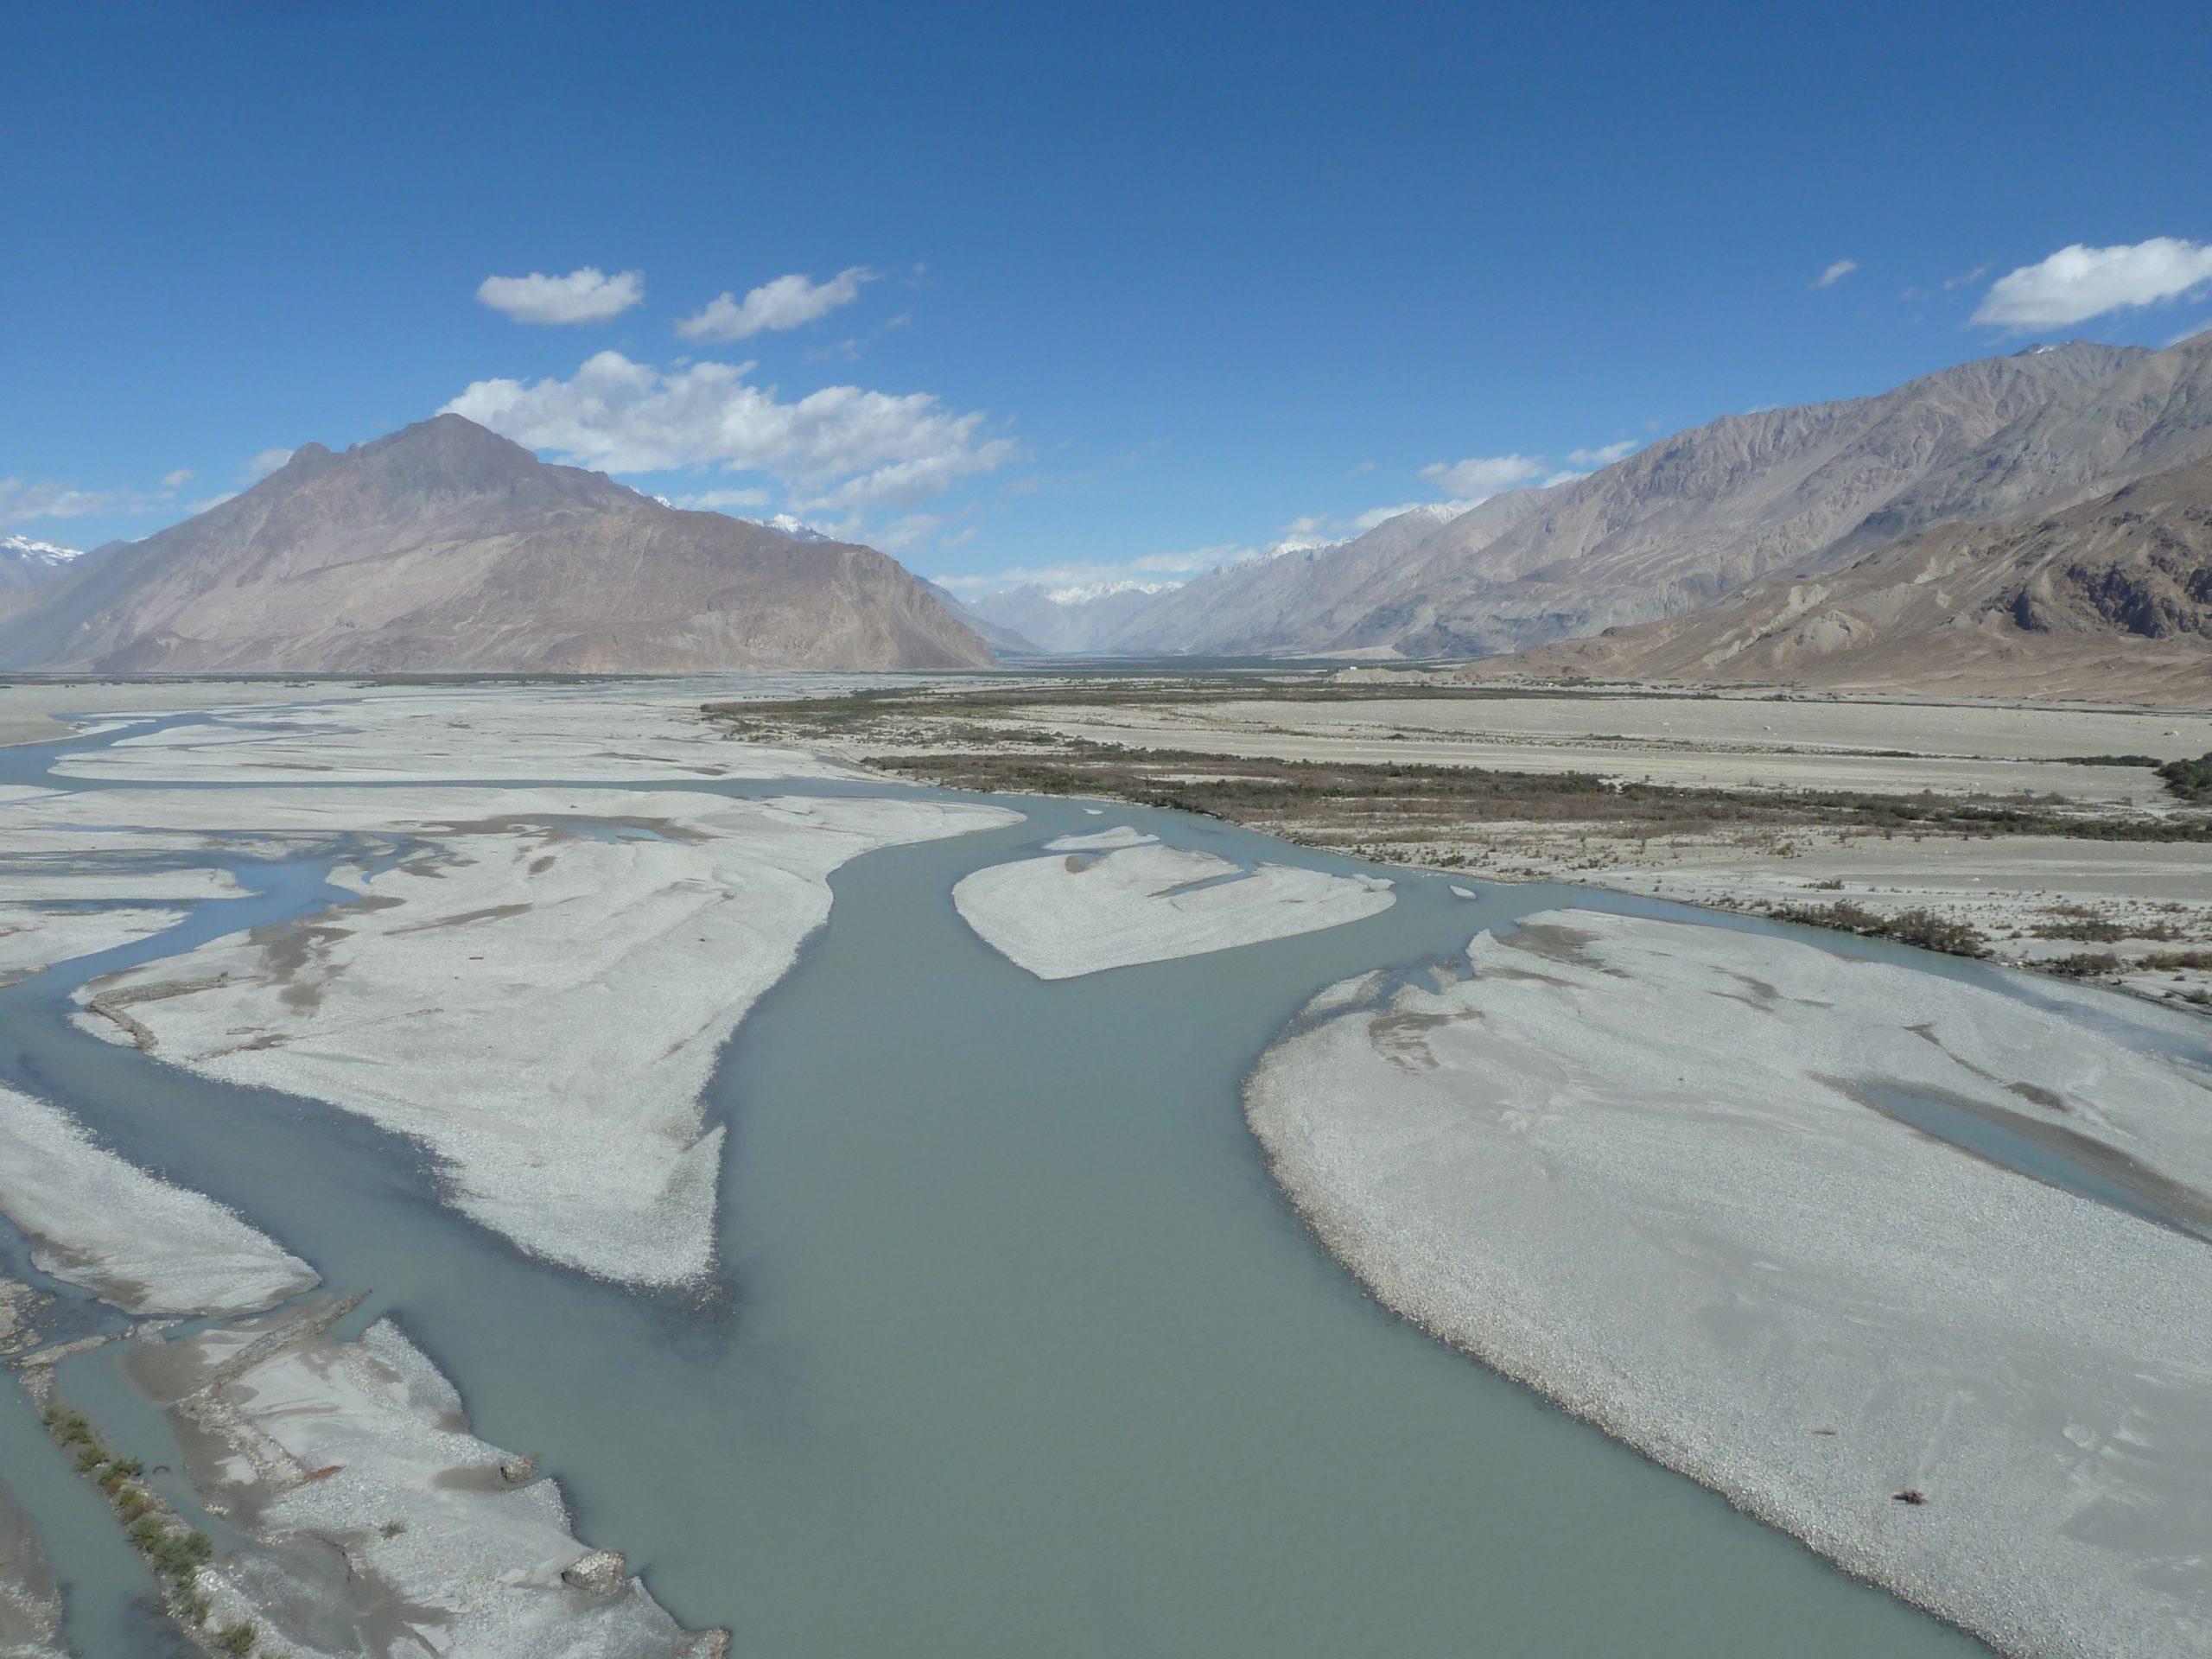 Radreise Ladakh 2012 - Links Shyok und rechts Nubra